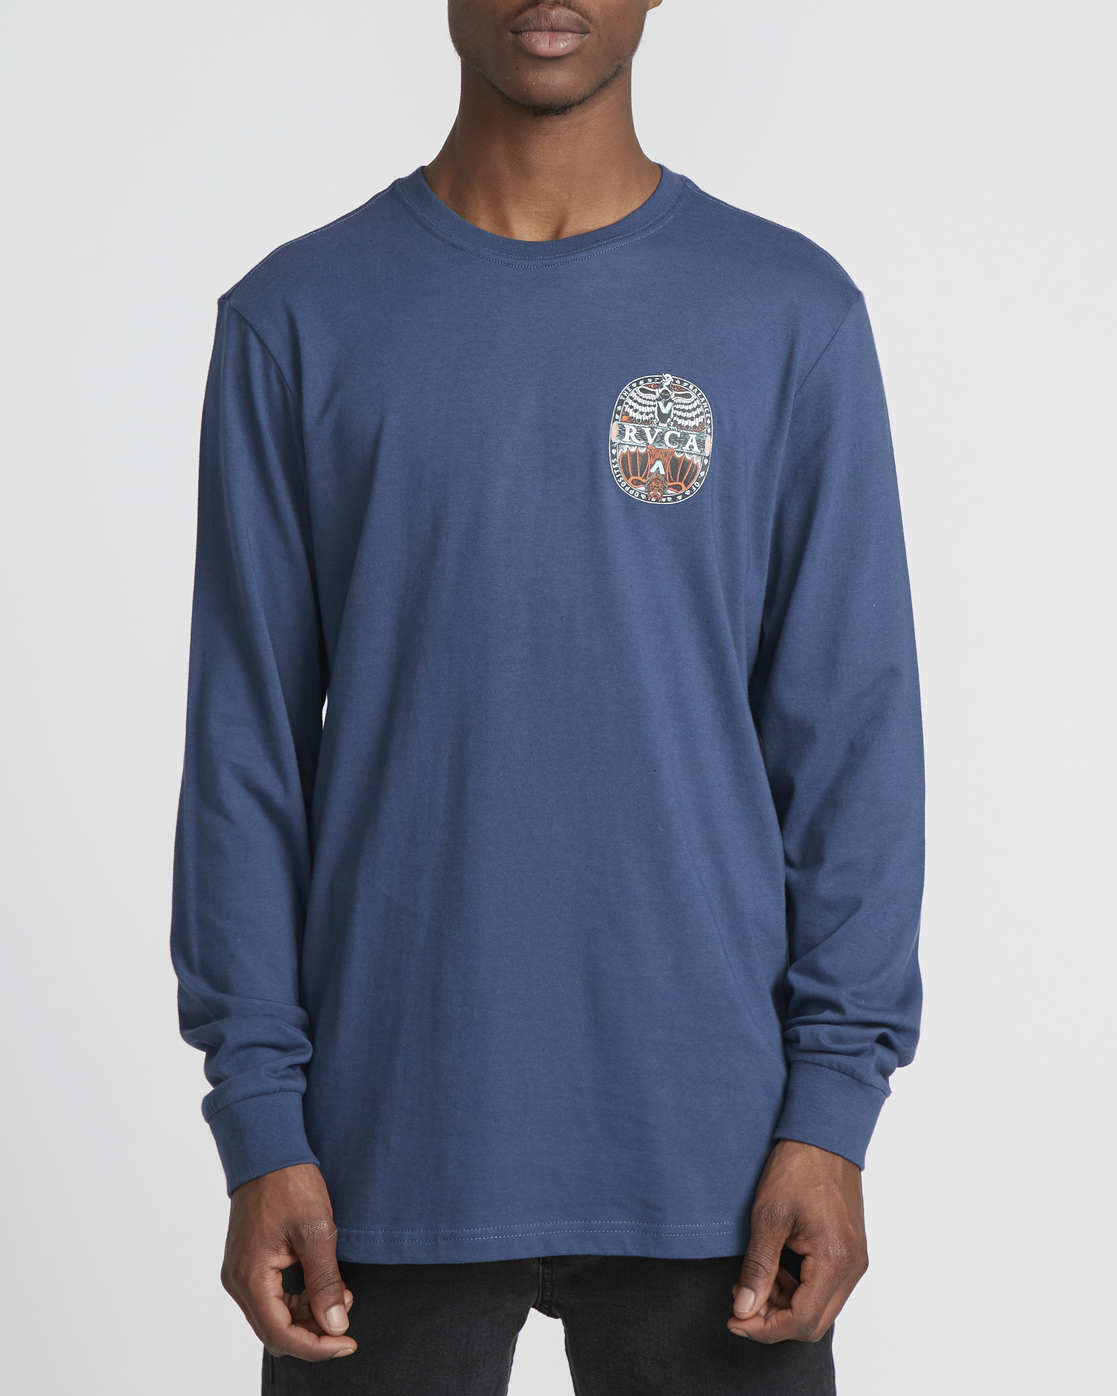 0 Martin Ander Mander  - Maglietta a Maniche Lunghe da Uomo Blue Q1LSRERVF9 RVCA